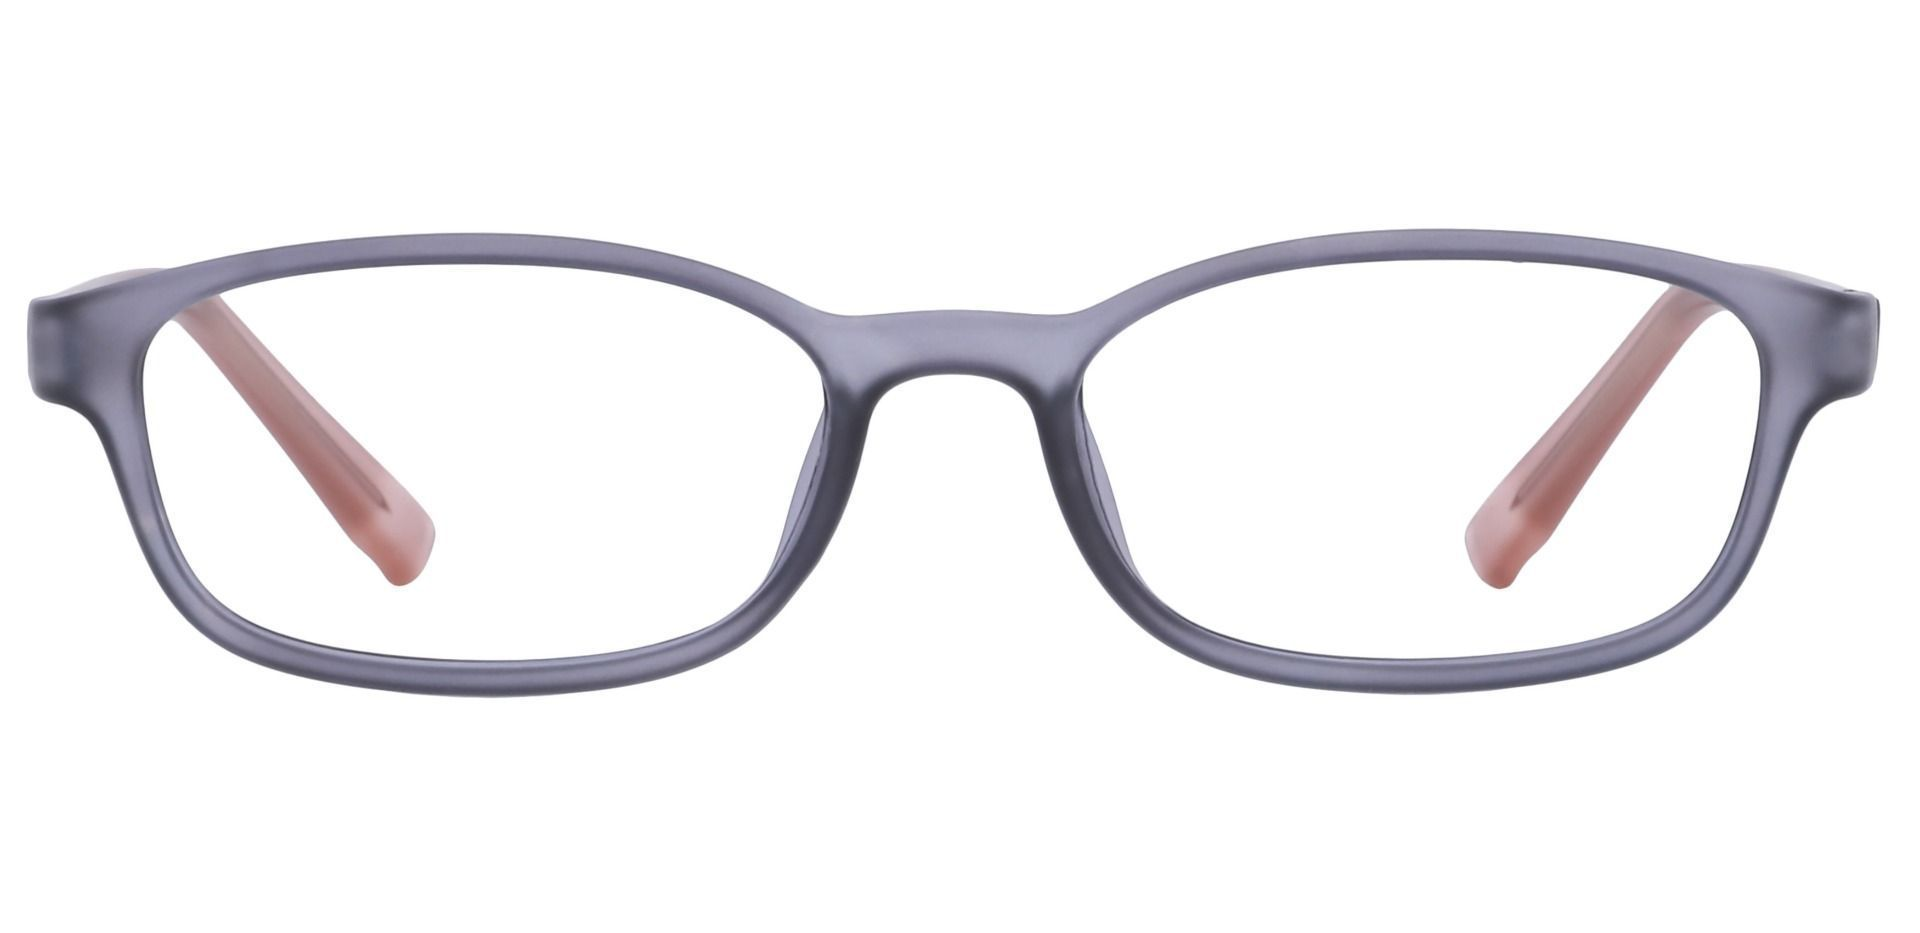 Kia Oval Single Vision Glasses - Grey Matte